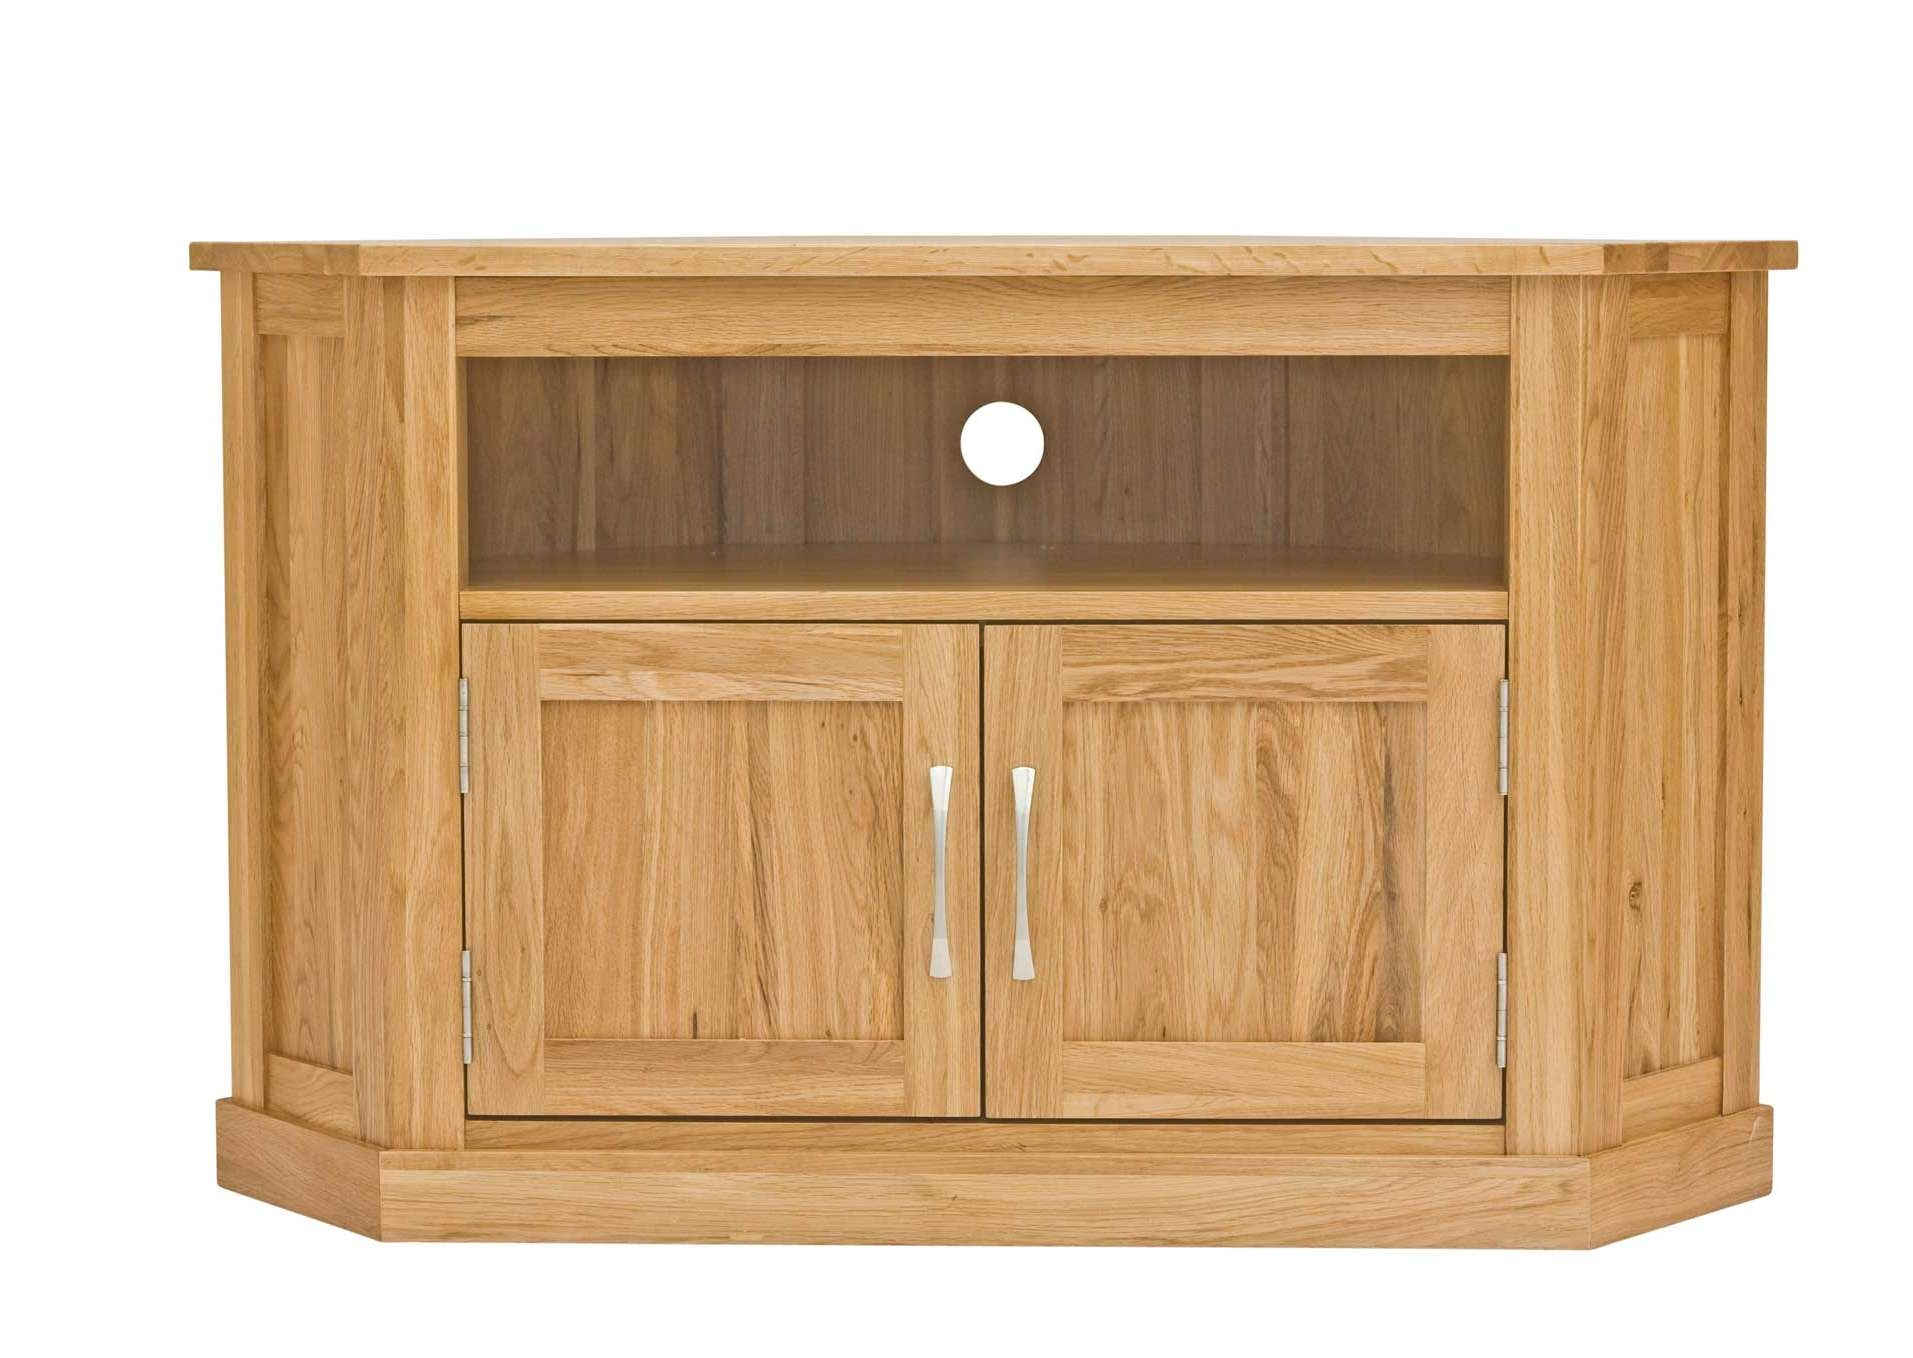 Classic Oak Corner Television Cabinet | Hampshire Furniture With Regard To Solid Oak Corner Tv Cabinets (View 5 of 20)